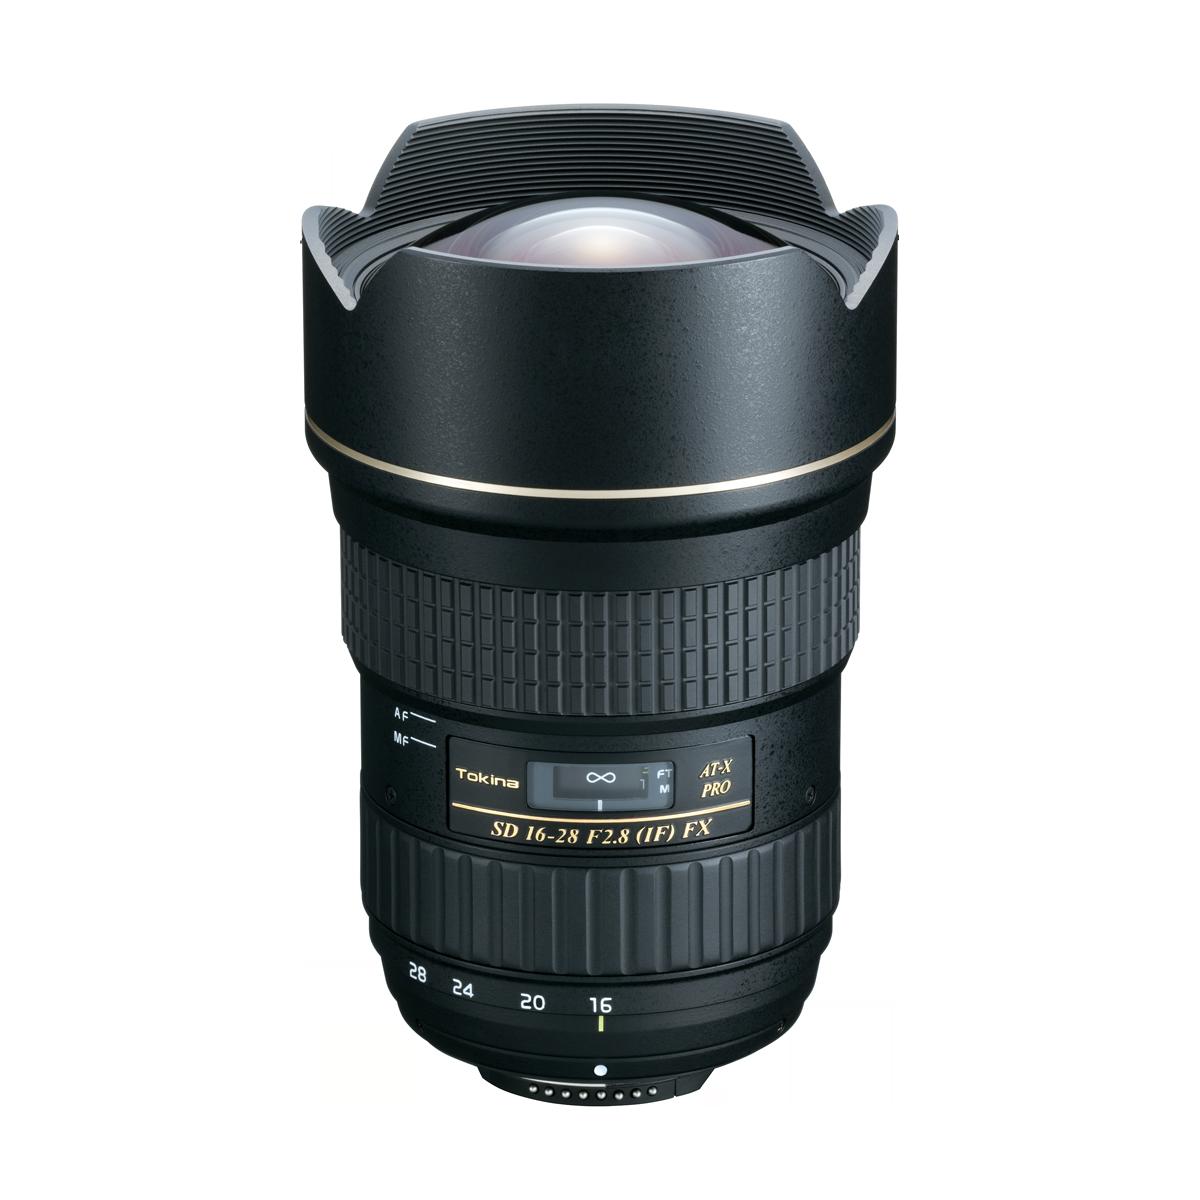 TOKINA - AT-X 16-28mm F2.8 FX monture Nikon - Objectif photo